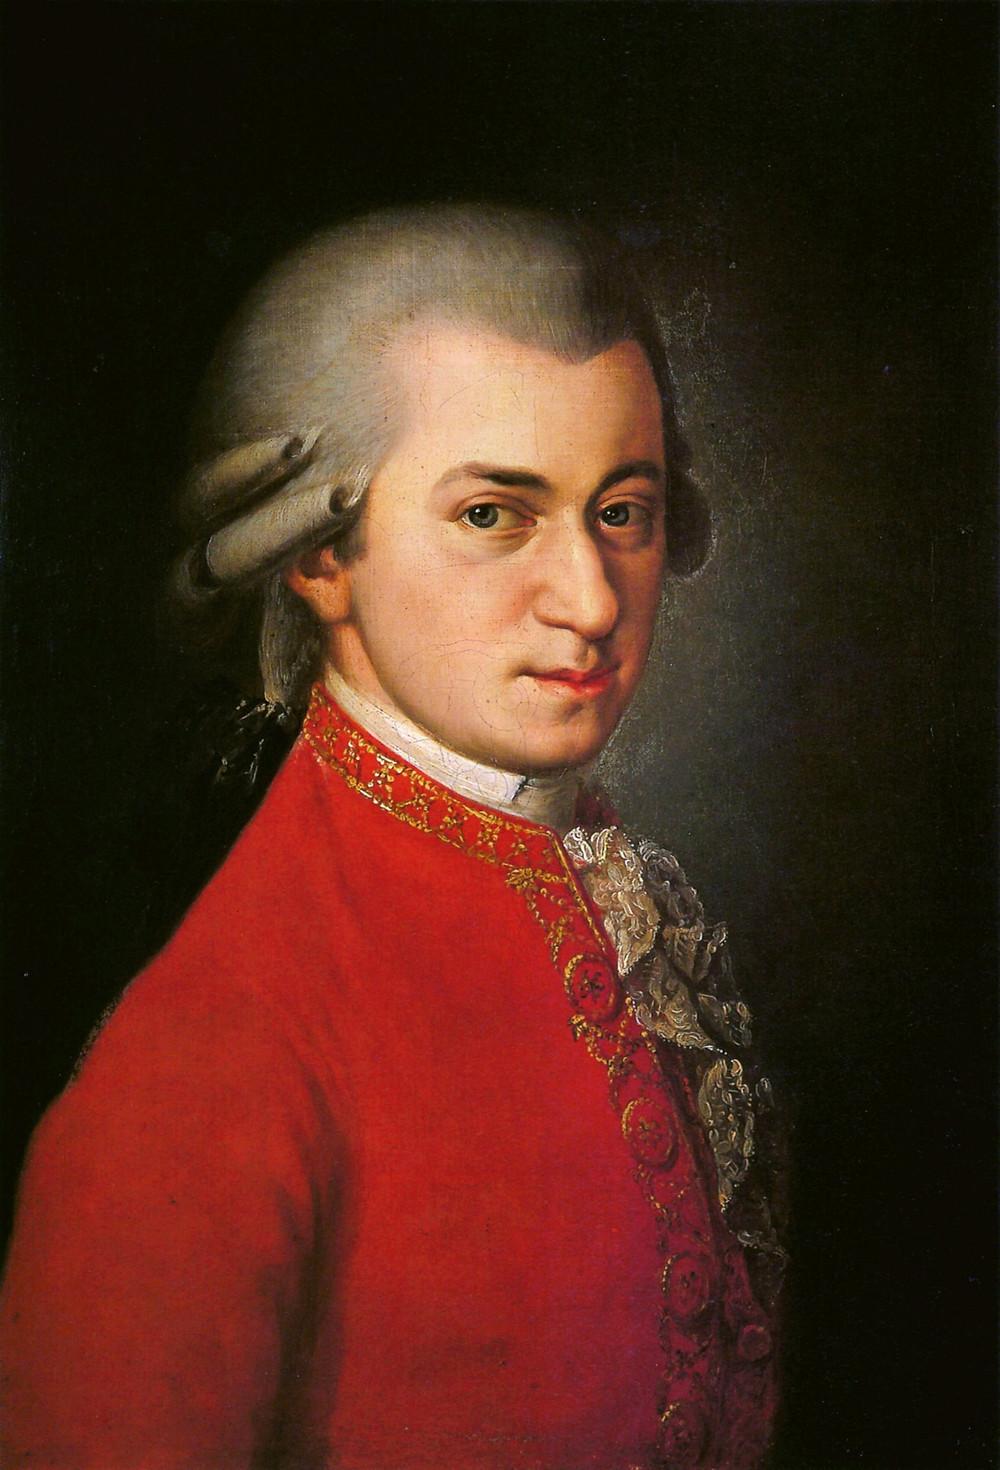 Composer Wolfgang Amadeus Mozart photo